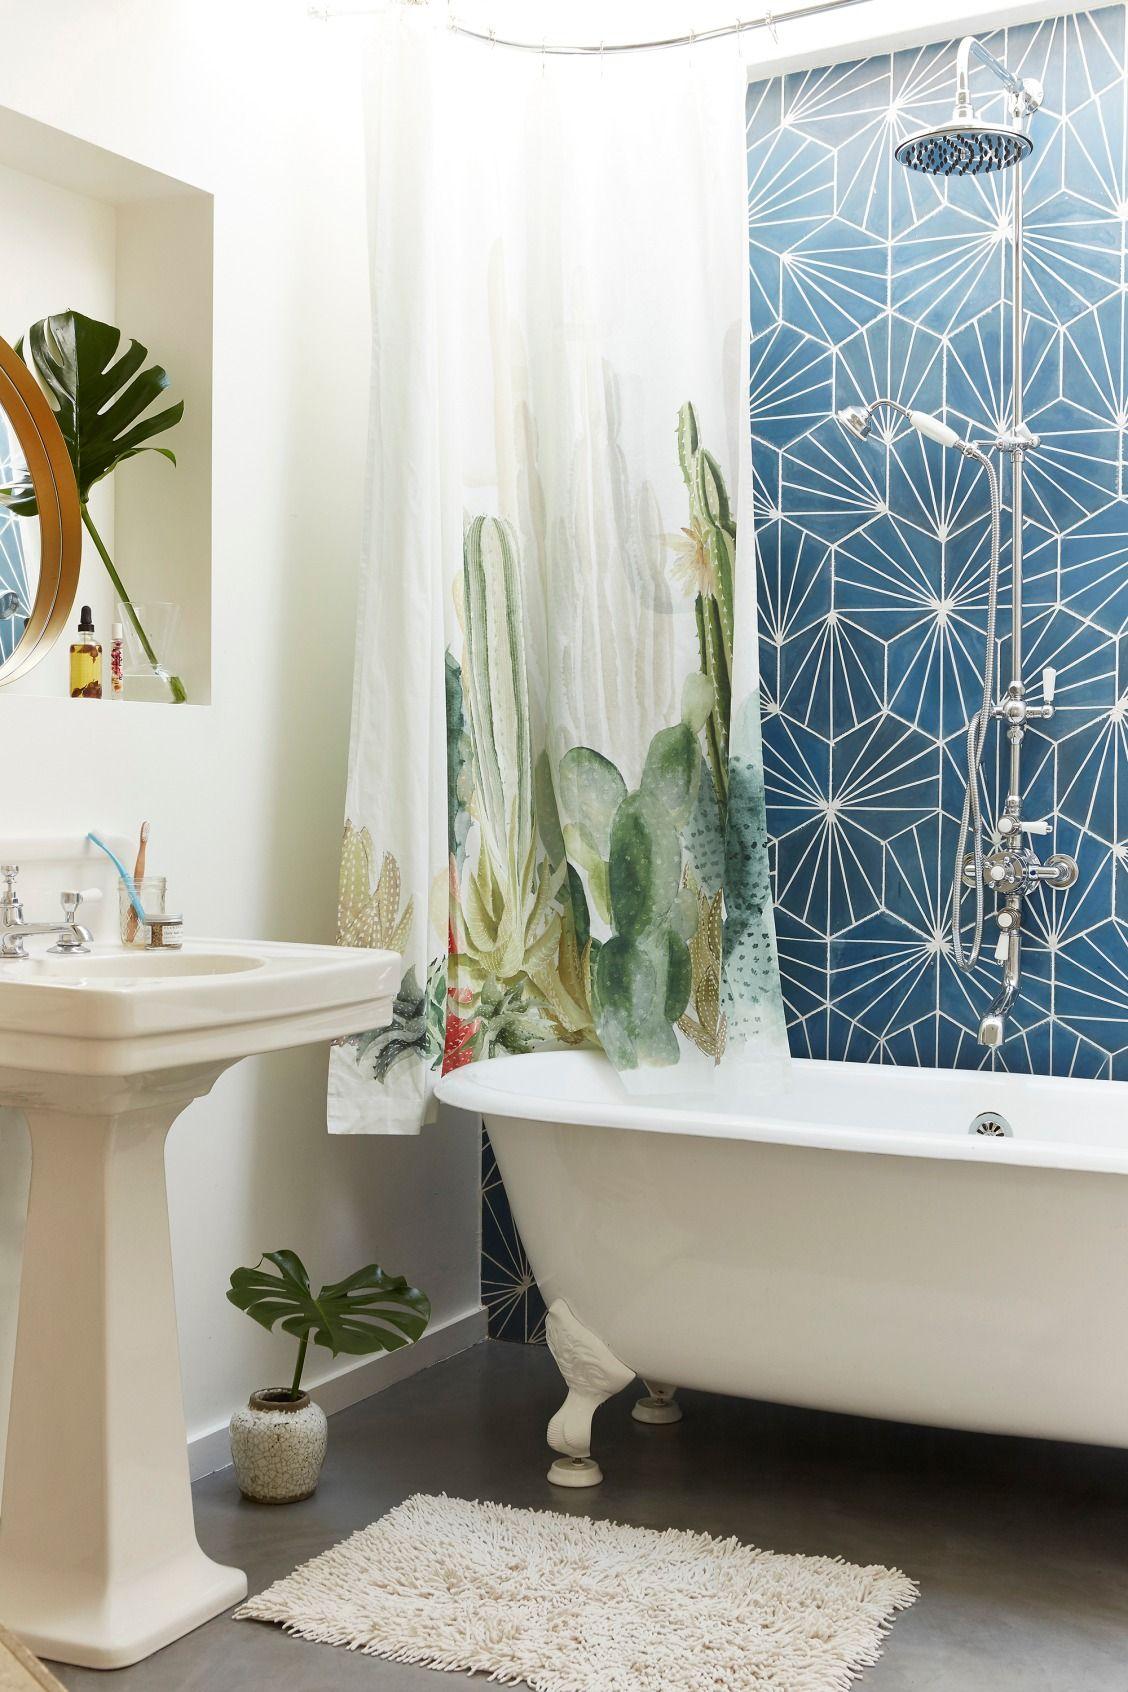 Pinterest Heddiling Bohemian Style Bathroom Boho Bathroom Decor Boho Bathroom